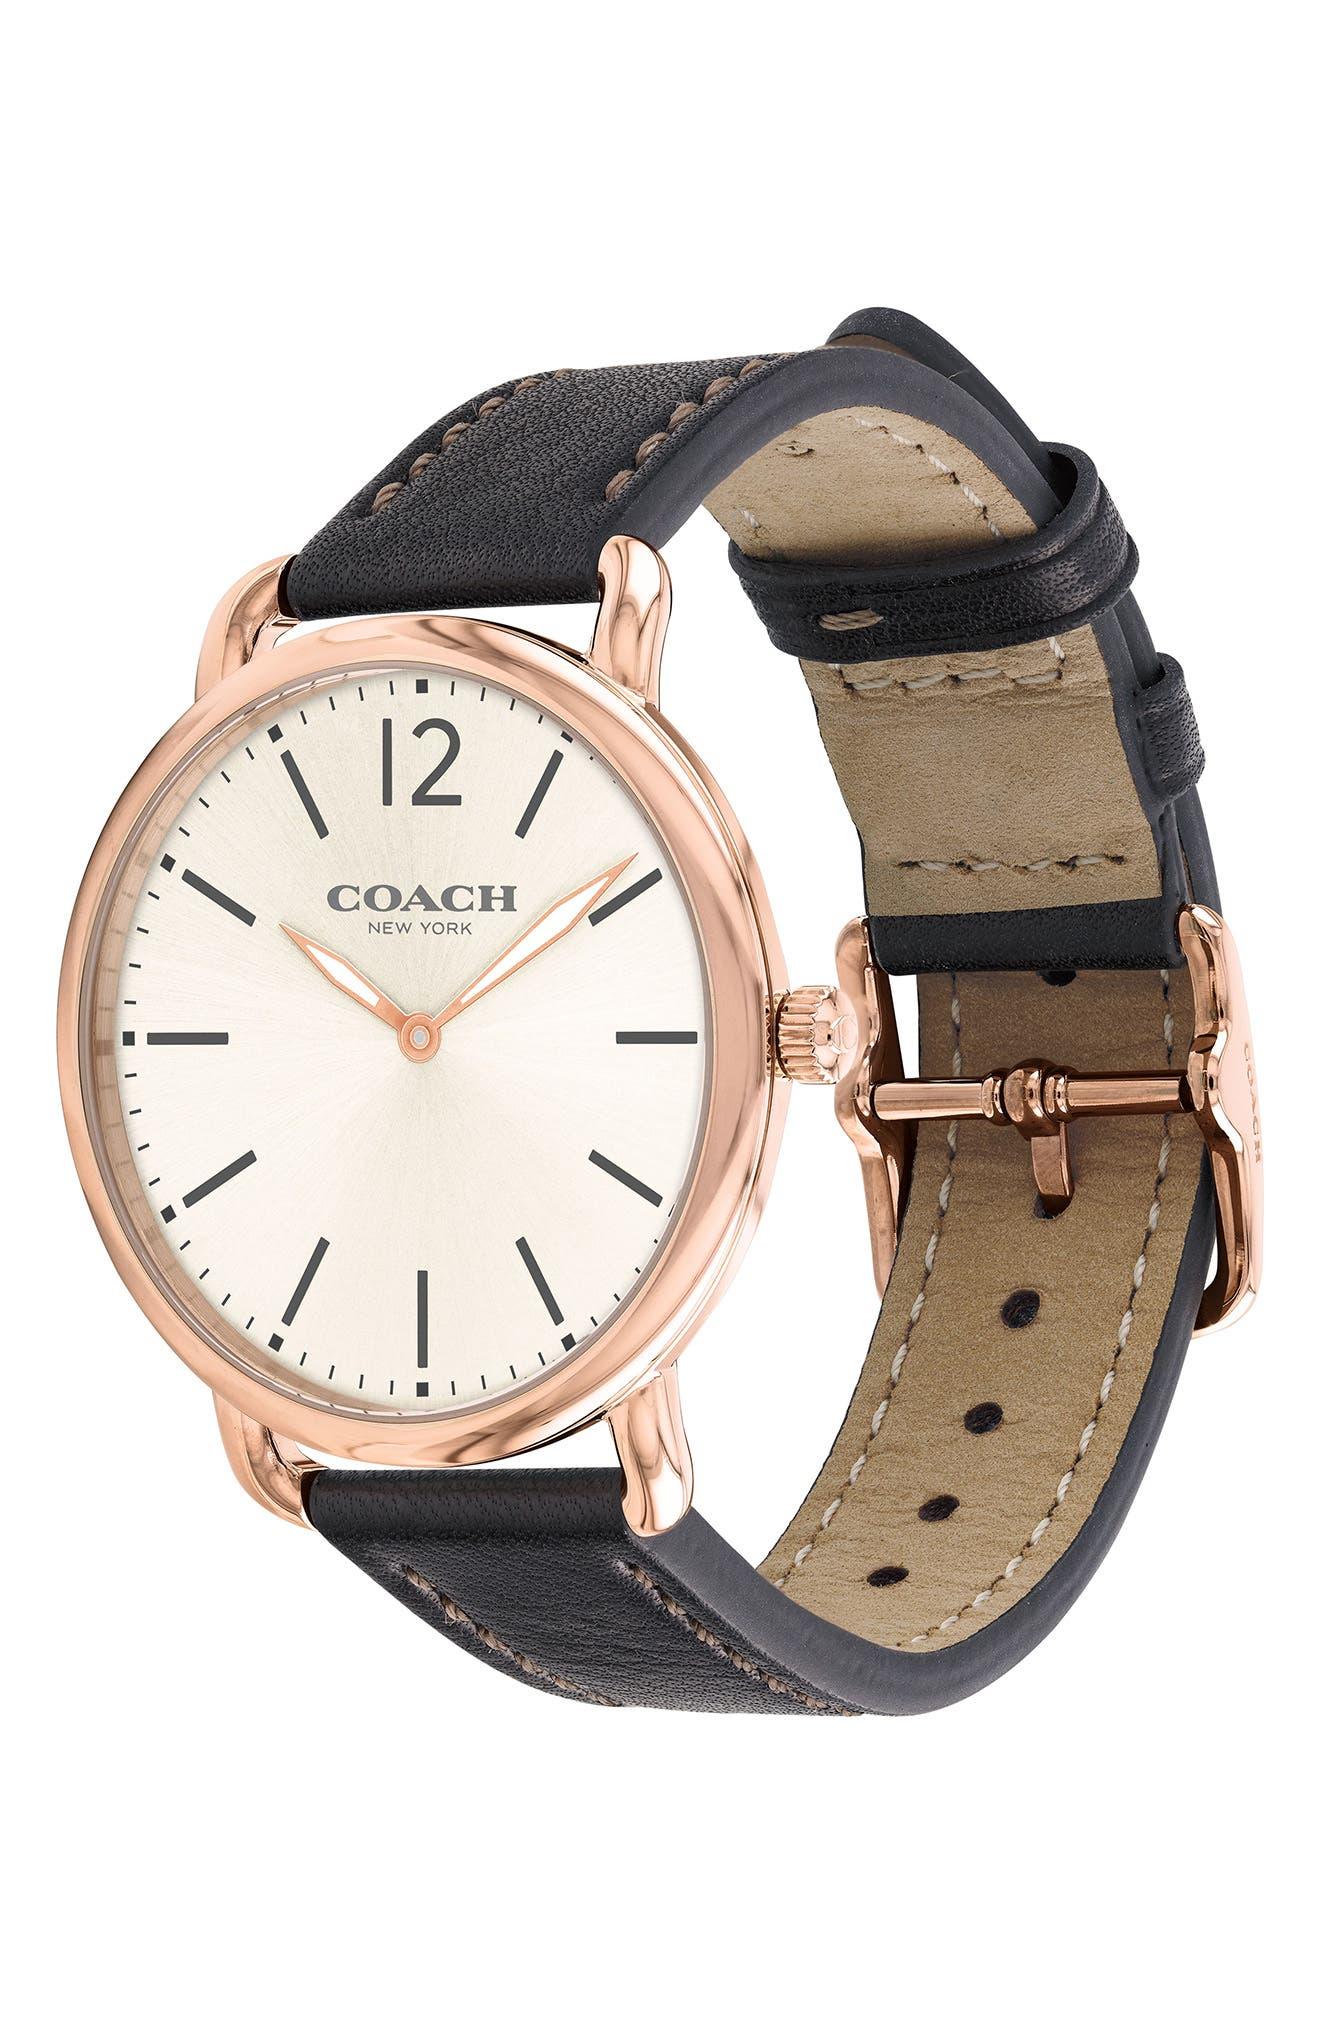 Delancey Leather Strap Watch, 40mm,                             Alternate thumbnail 3, color,                             BLACK/ CHALK/ ROSE GOLD